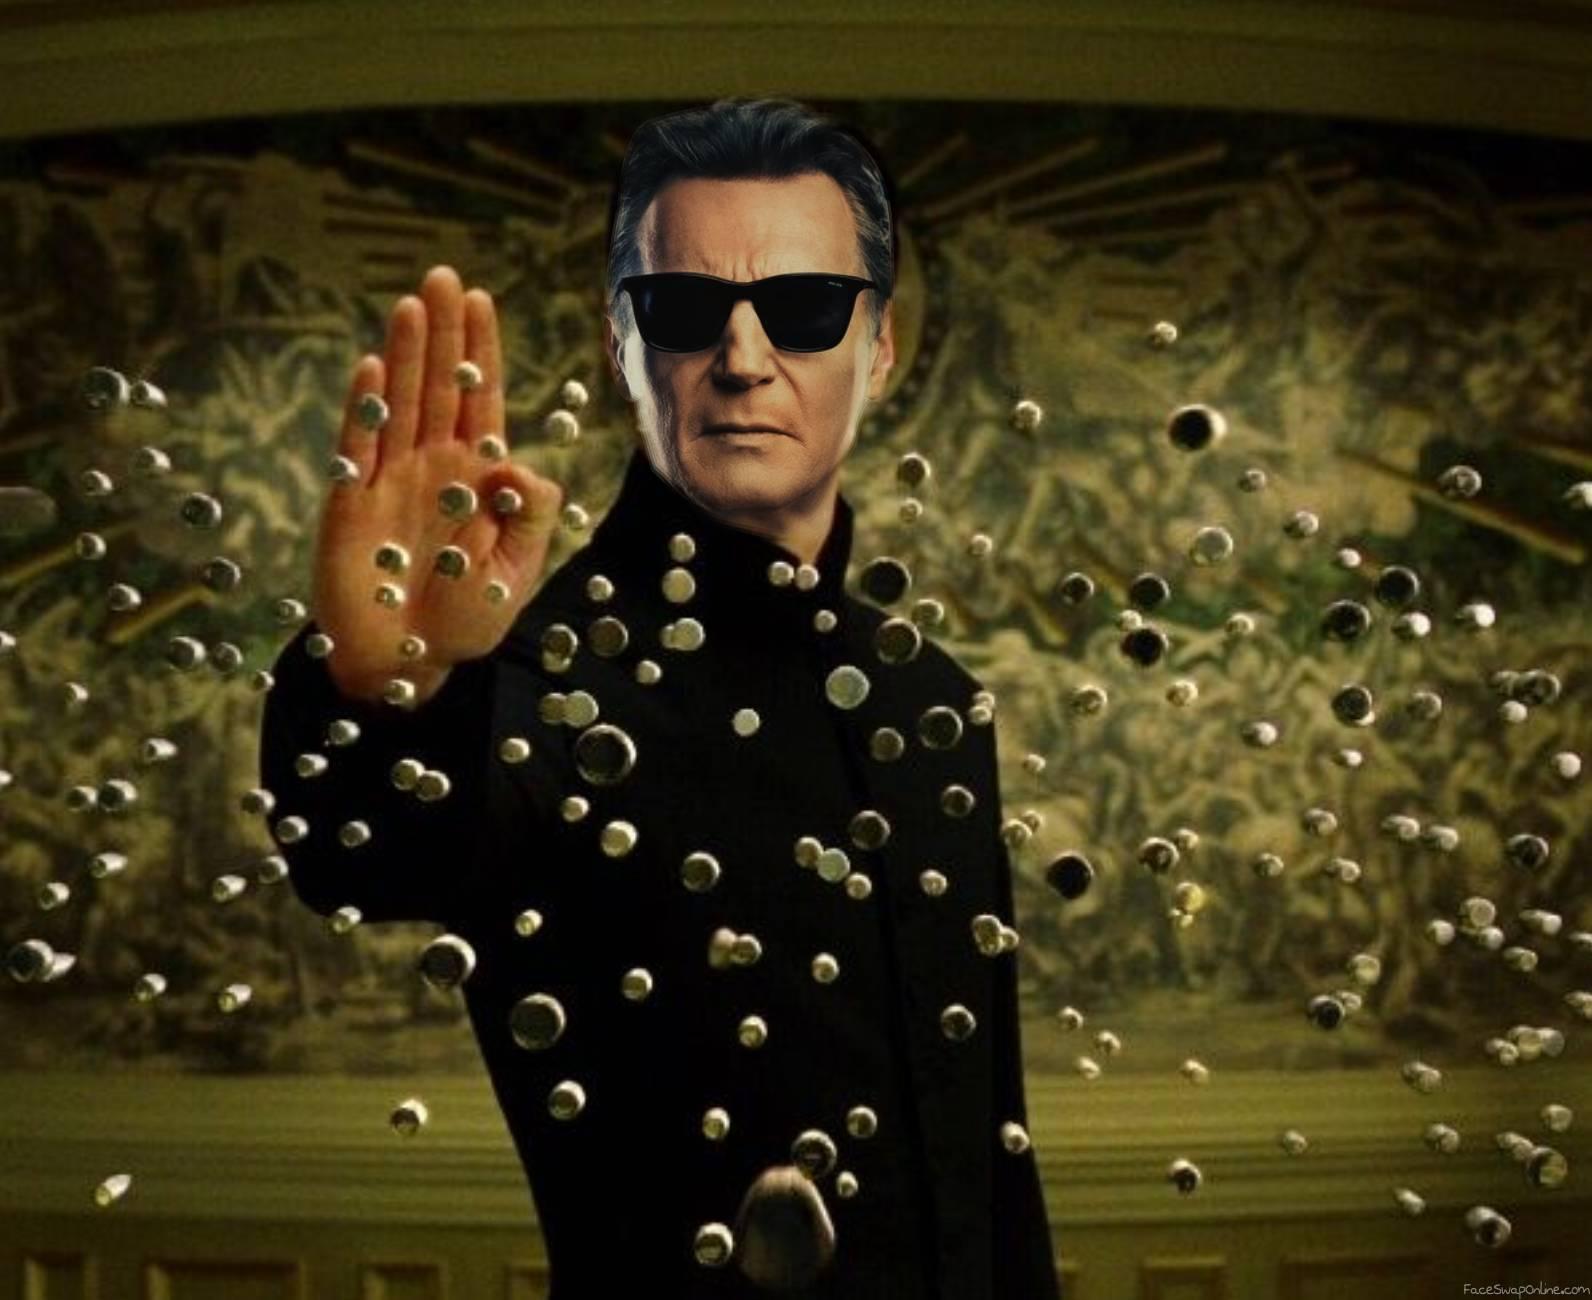 Matrix Deepfake